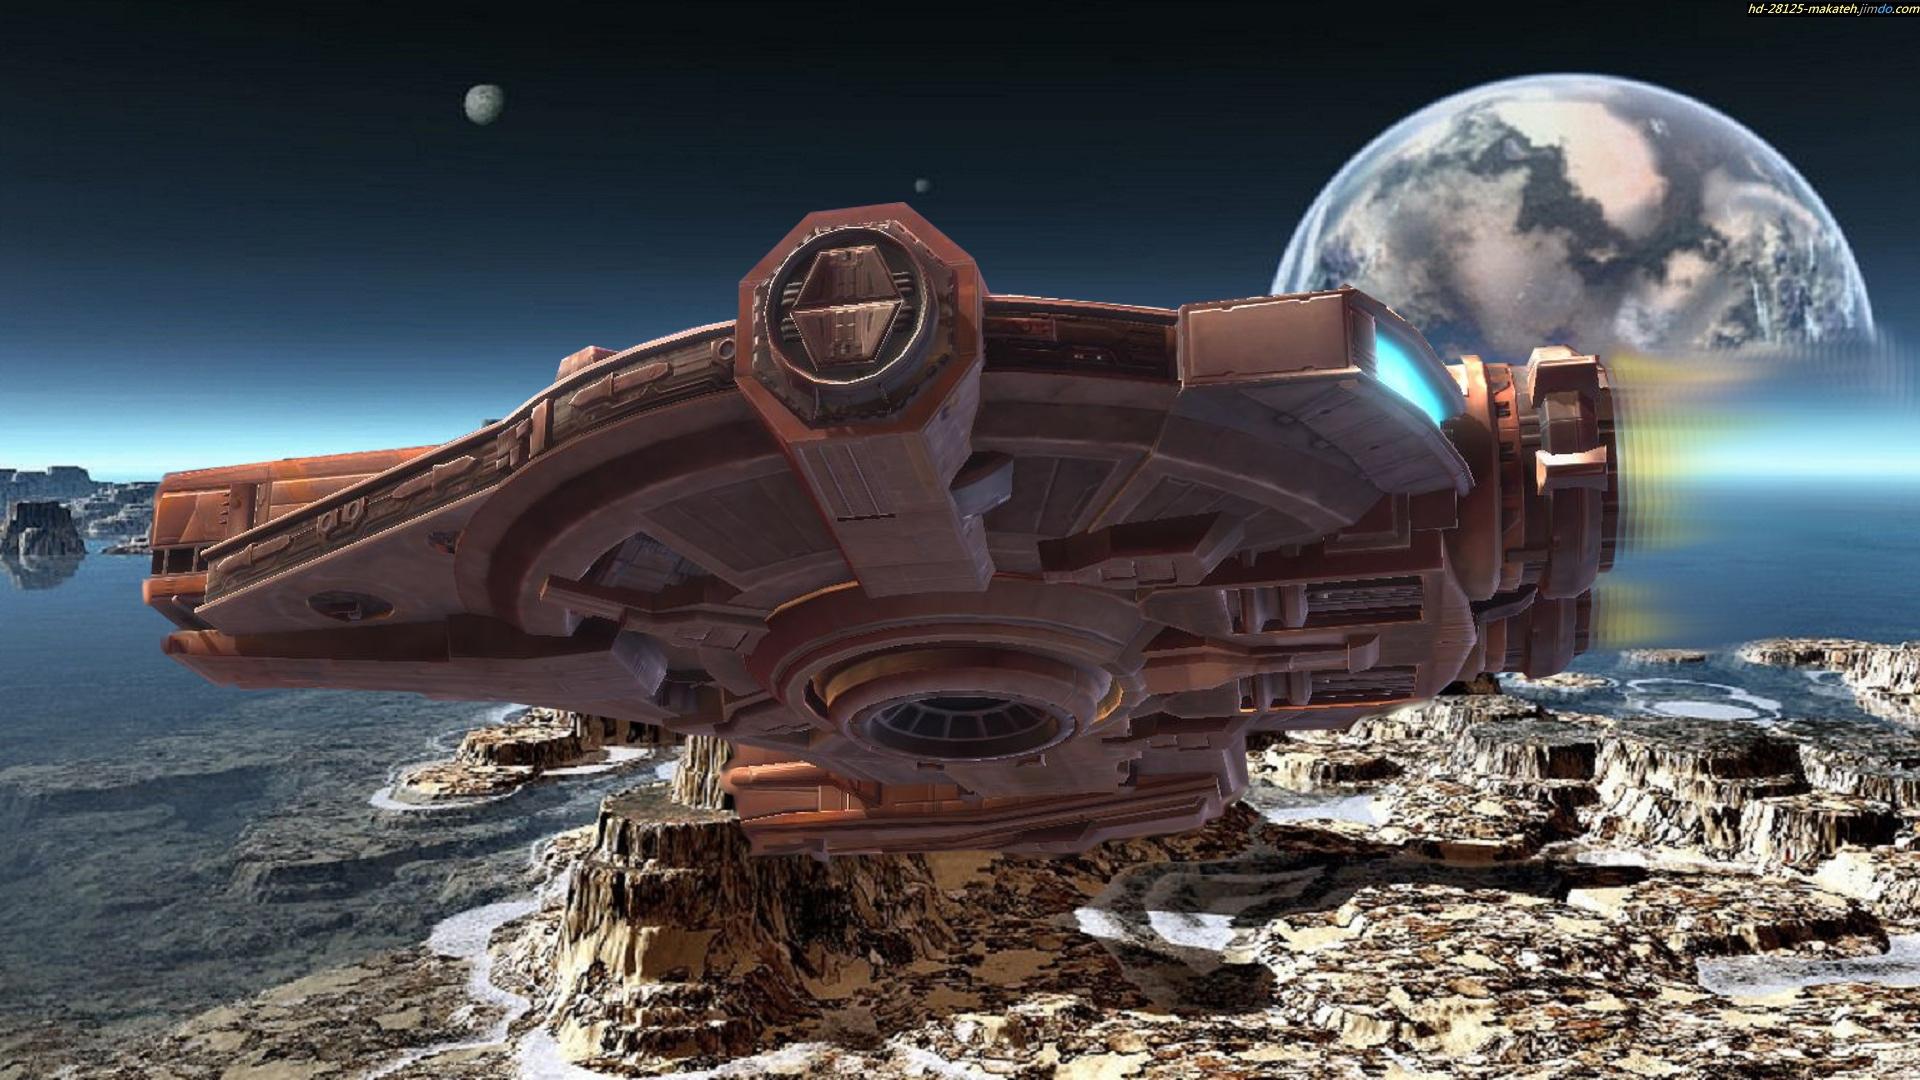 Andromeda Galaxy Wallpaper Iphone Star Wars Y2 Fonds D 233 Cran Arri 232 Res Plan 1920x1080 Id